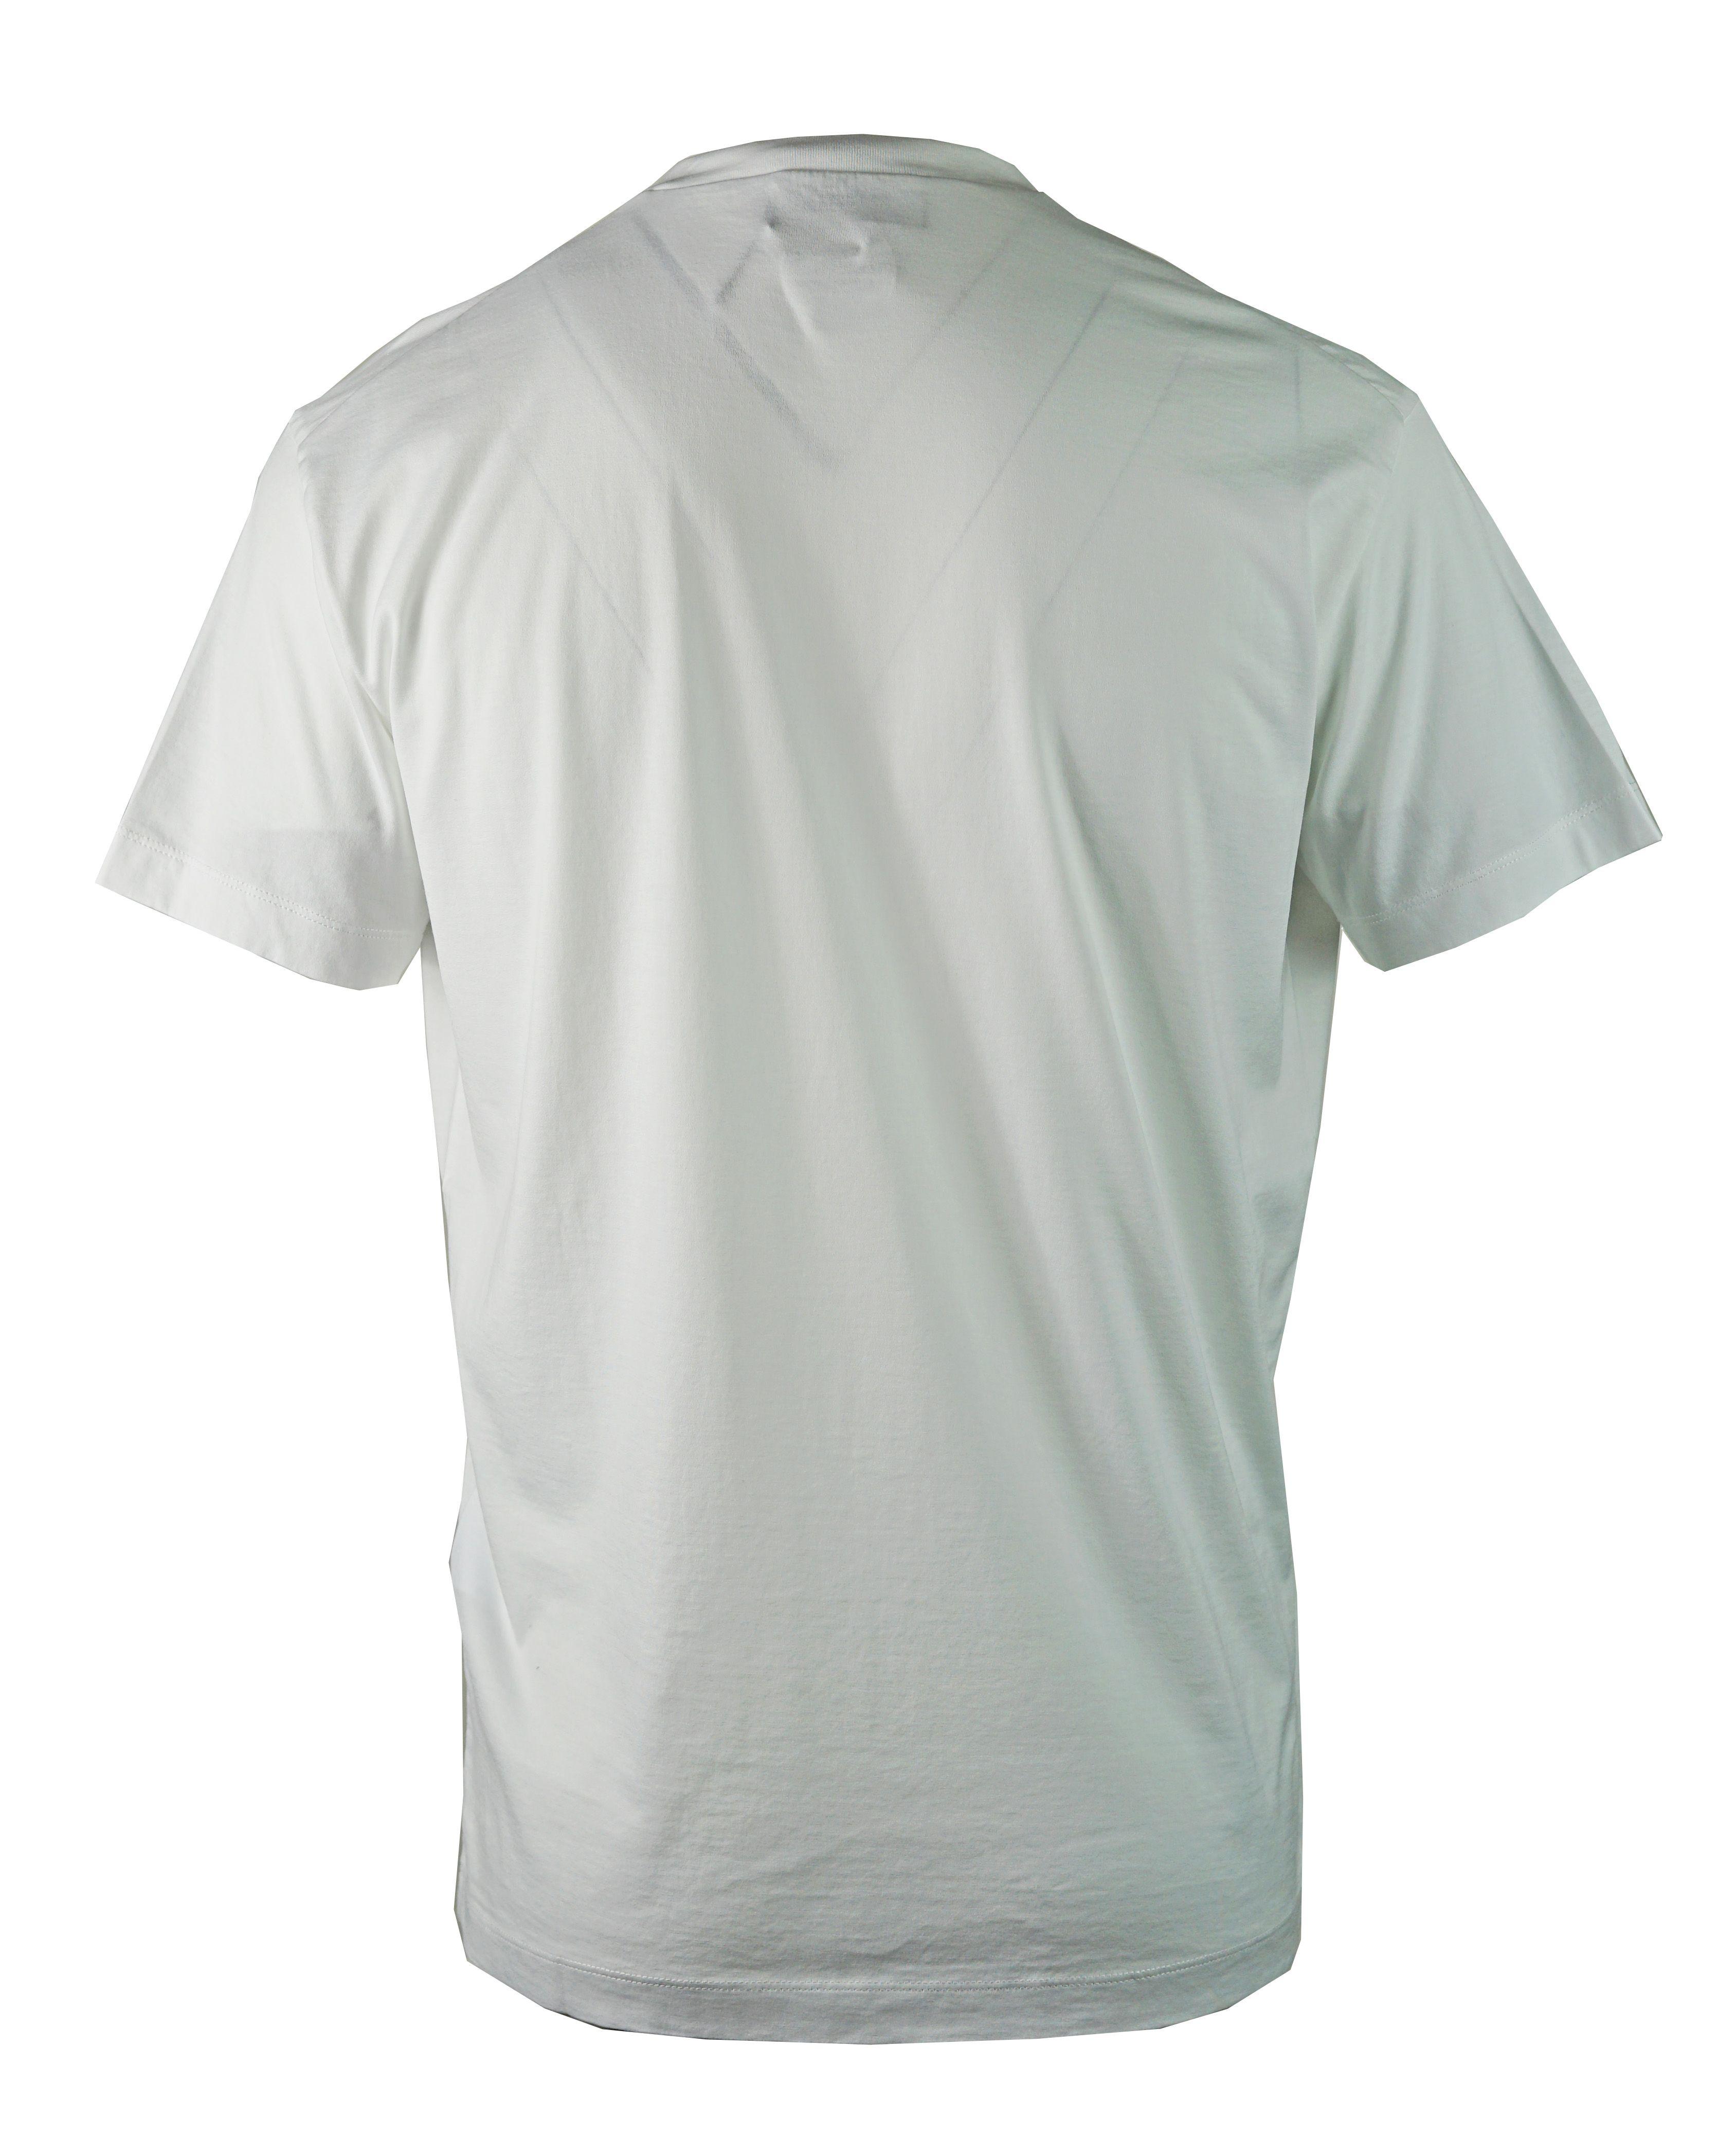 DSquared2 S74GD0494 S22427 100 T-Shirt